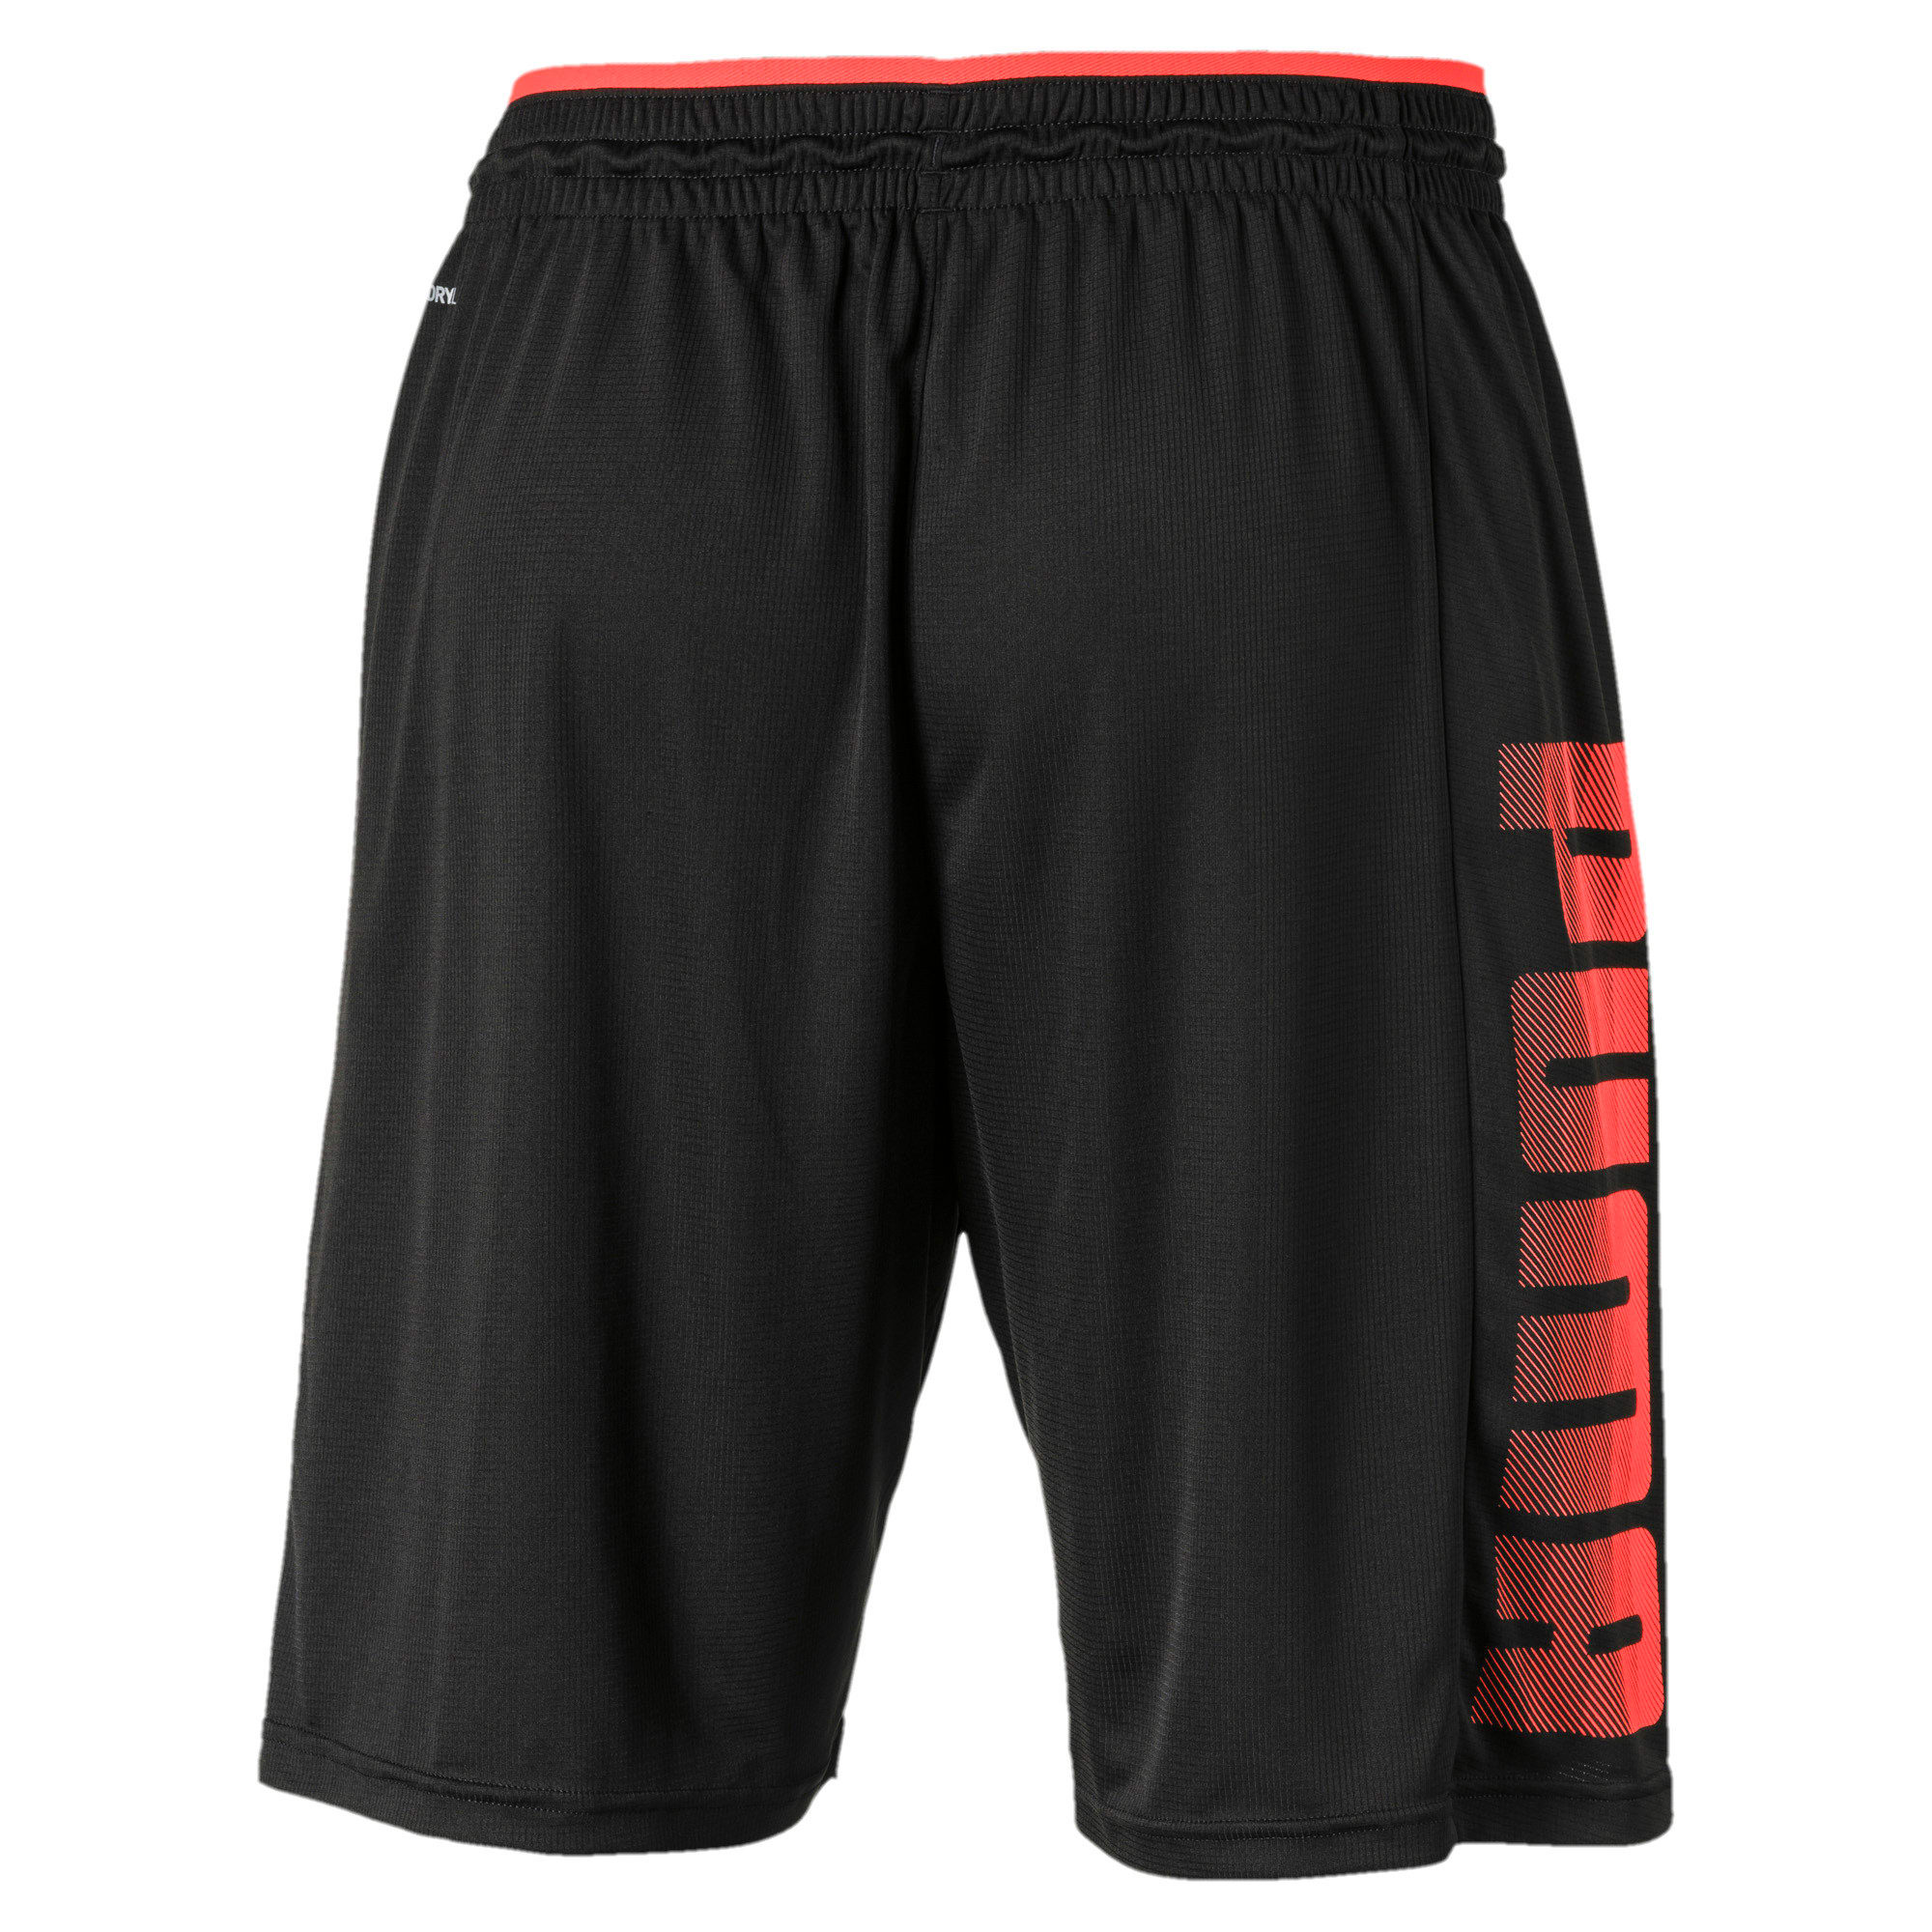 Miniatura 5 de Shorts de punto Collective para hombre, Puma Black-Nrgy Red, mediano